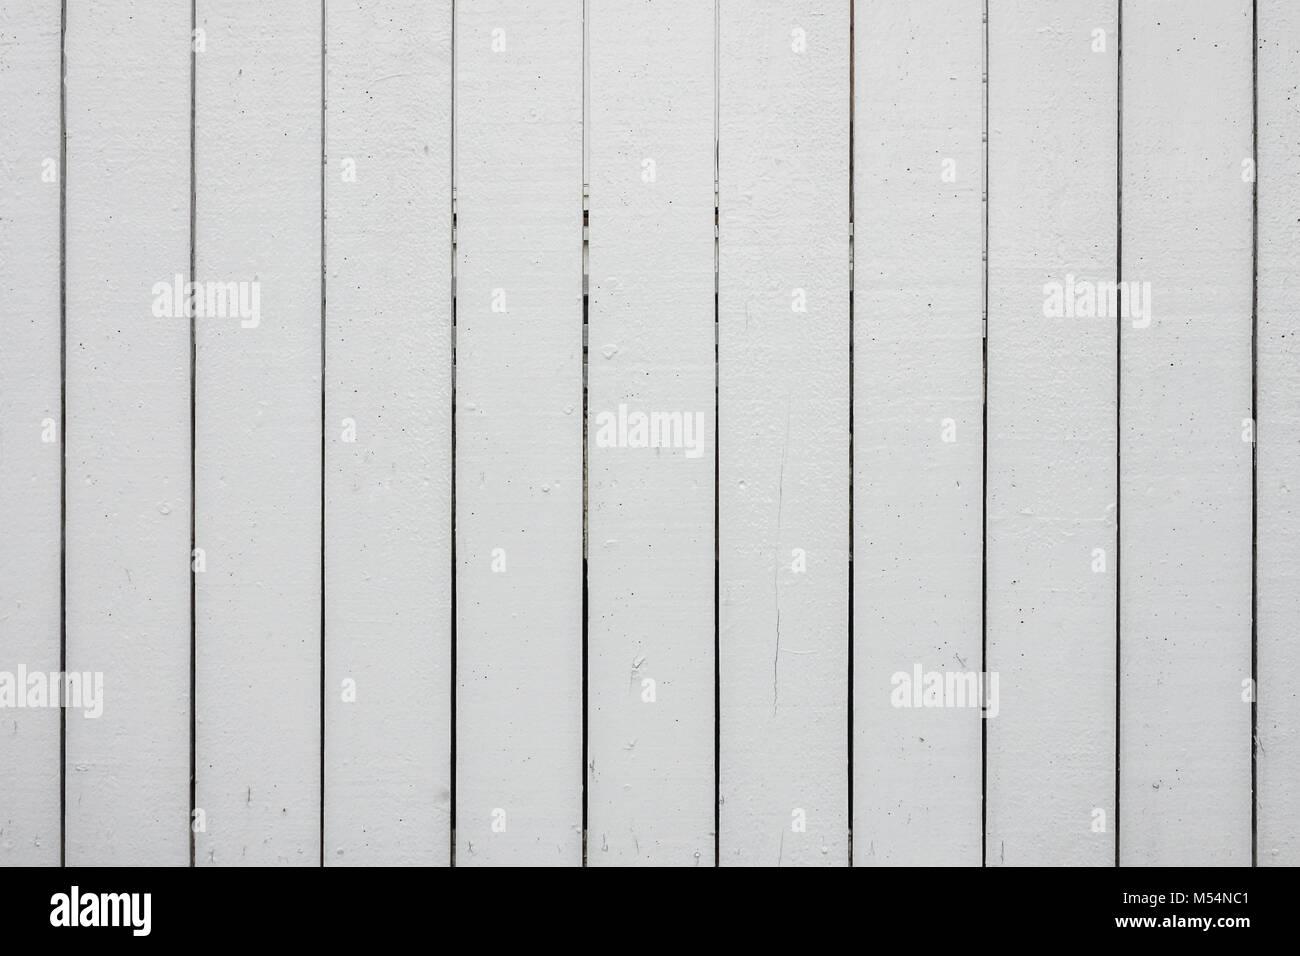 White fence texture background overlay - Stock Image